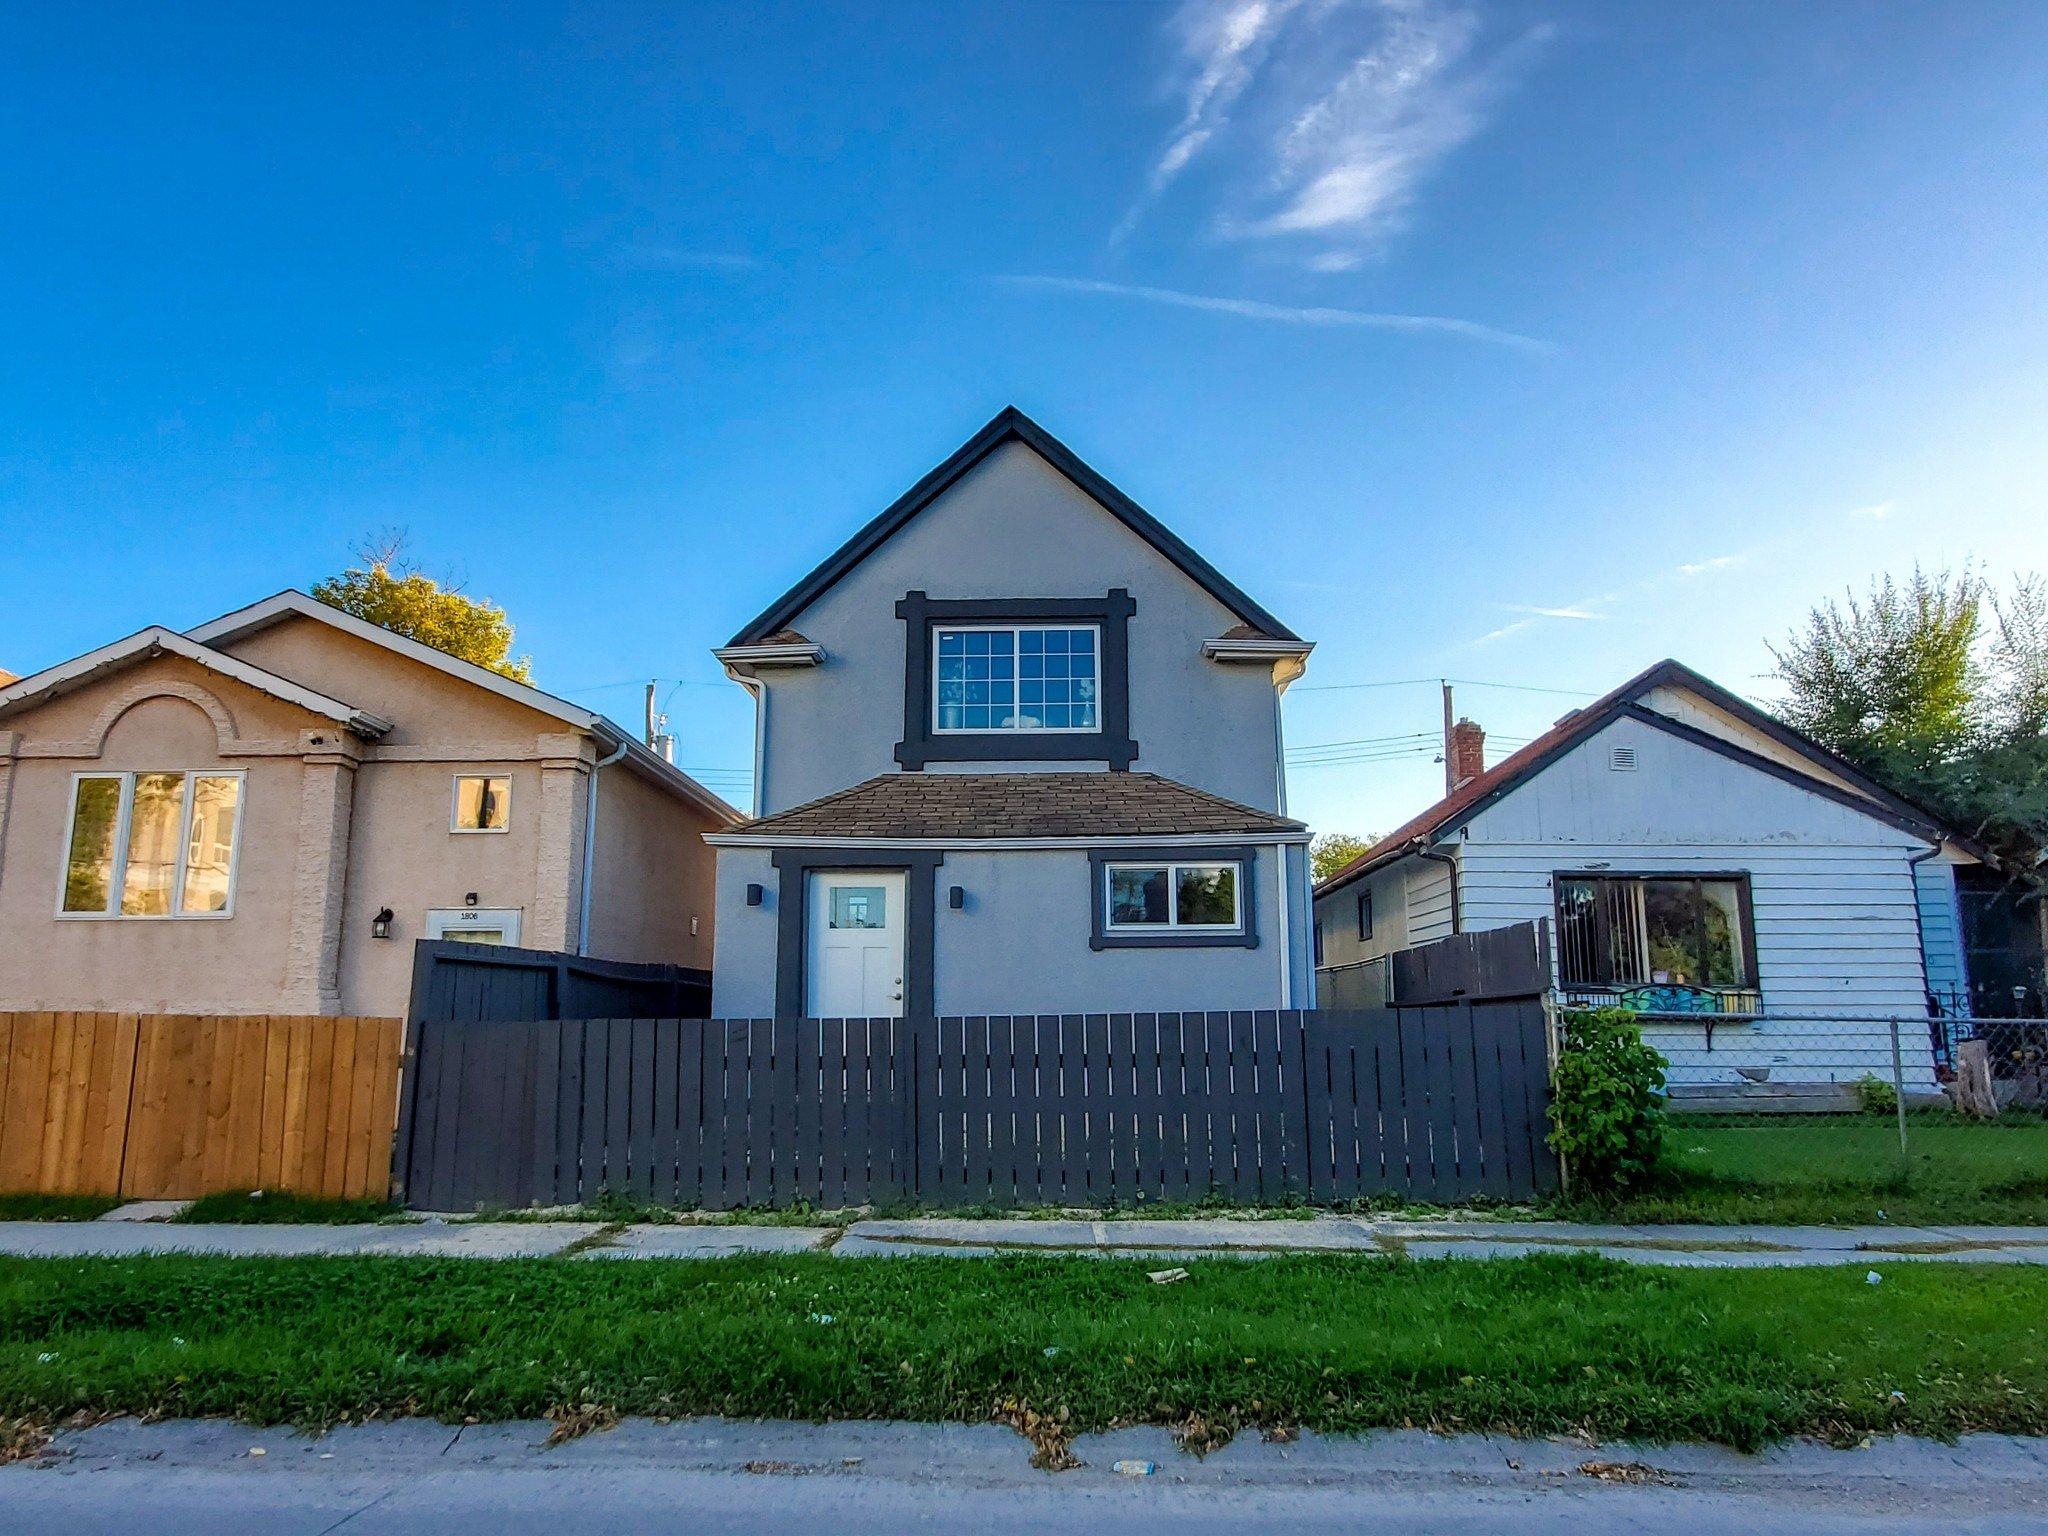 Main Photo: 1808 Alexander Avenue in Winnipeg: Single Family Detached for sale (5D)  : MLS®# 1927366